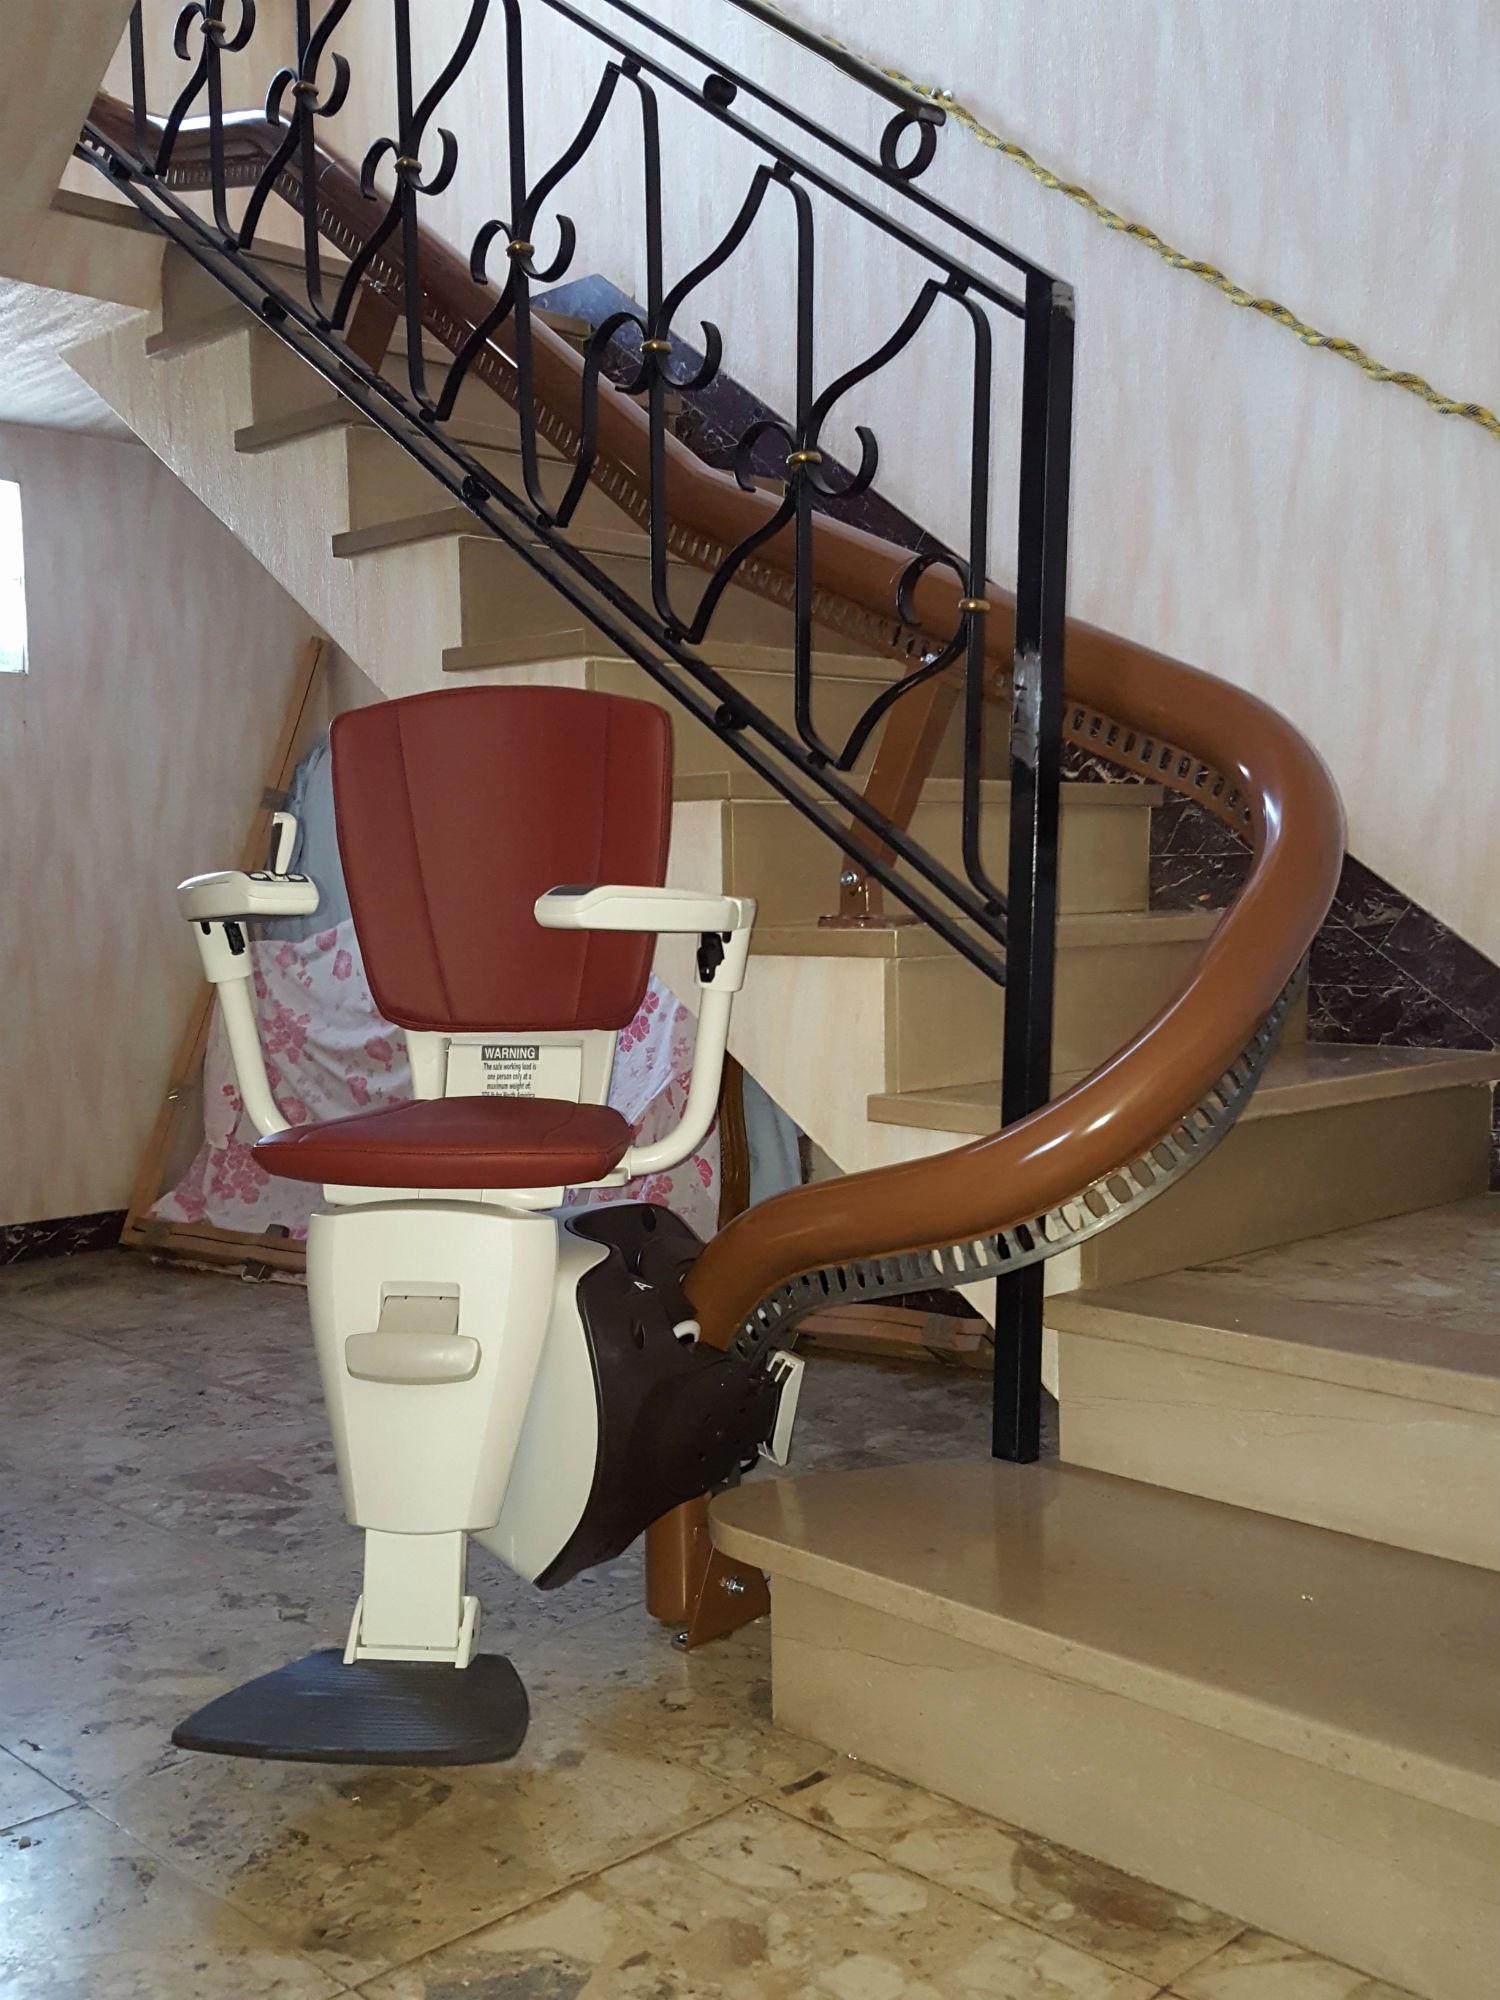 monte escalier occasion pas cher. Black Bedroom Furniture Sets. Home Design Ideas